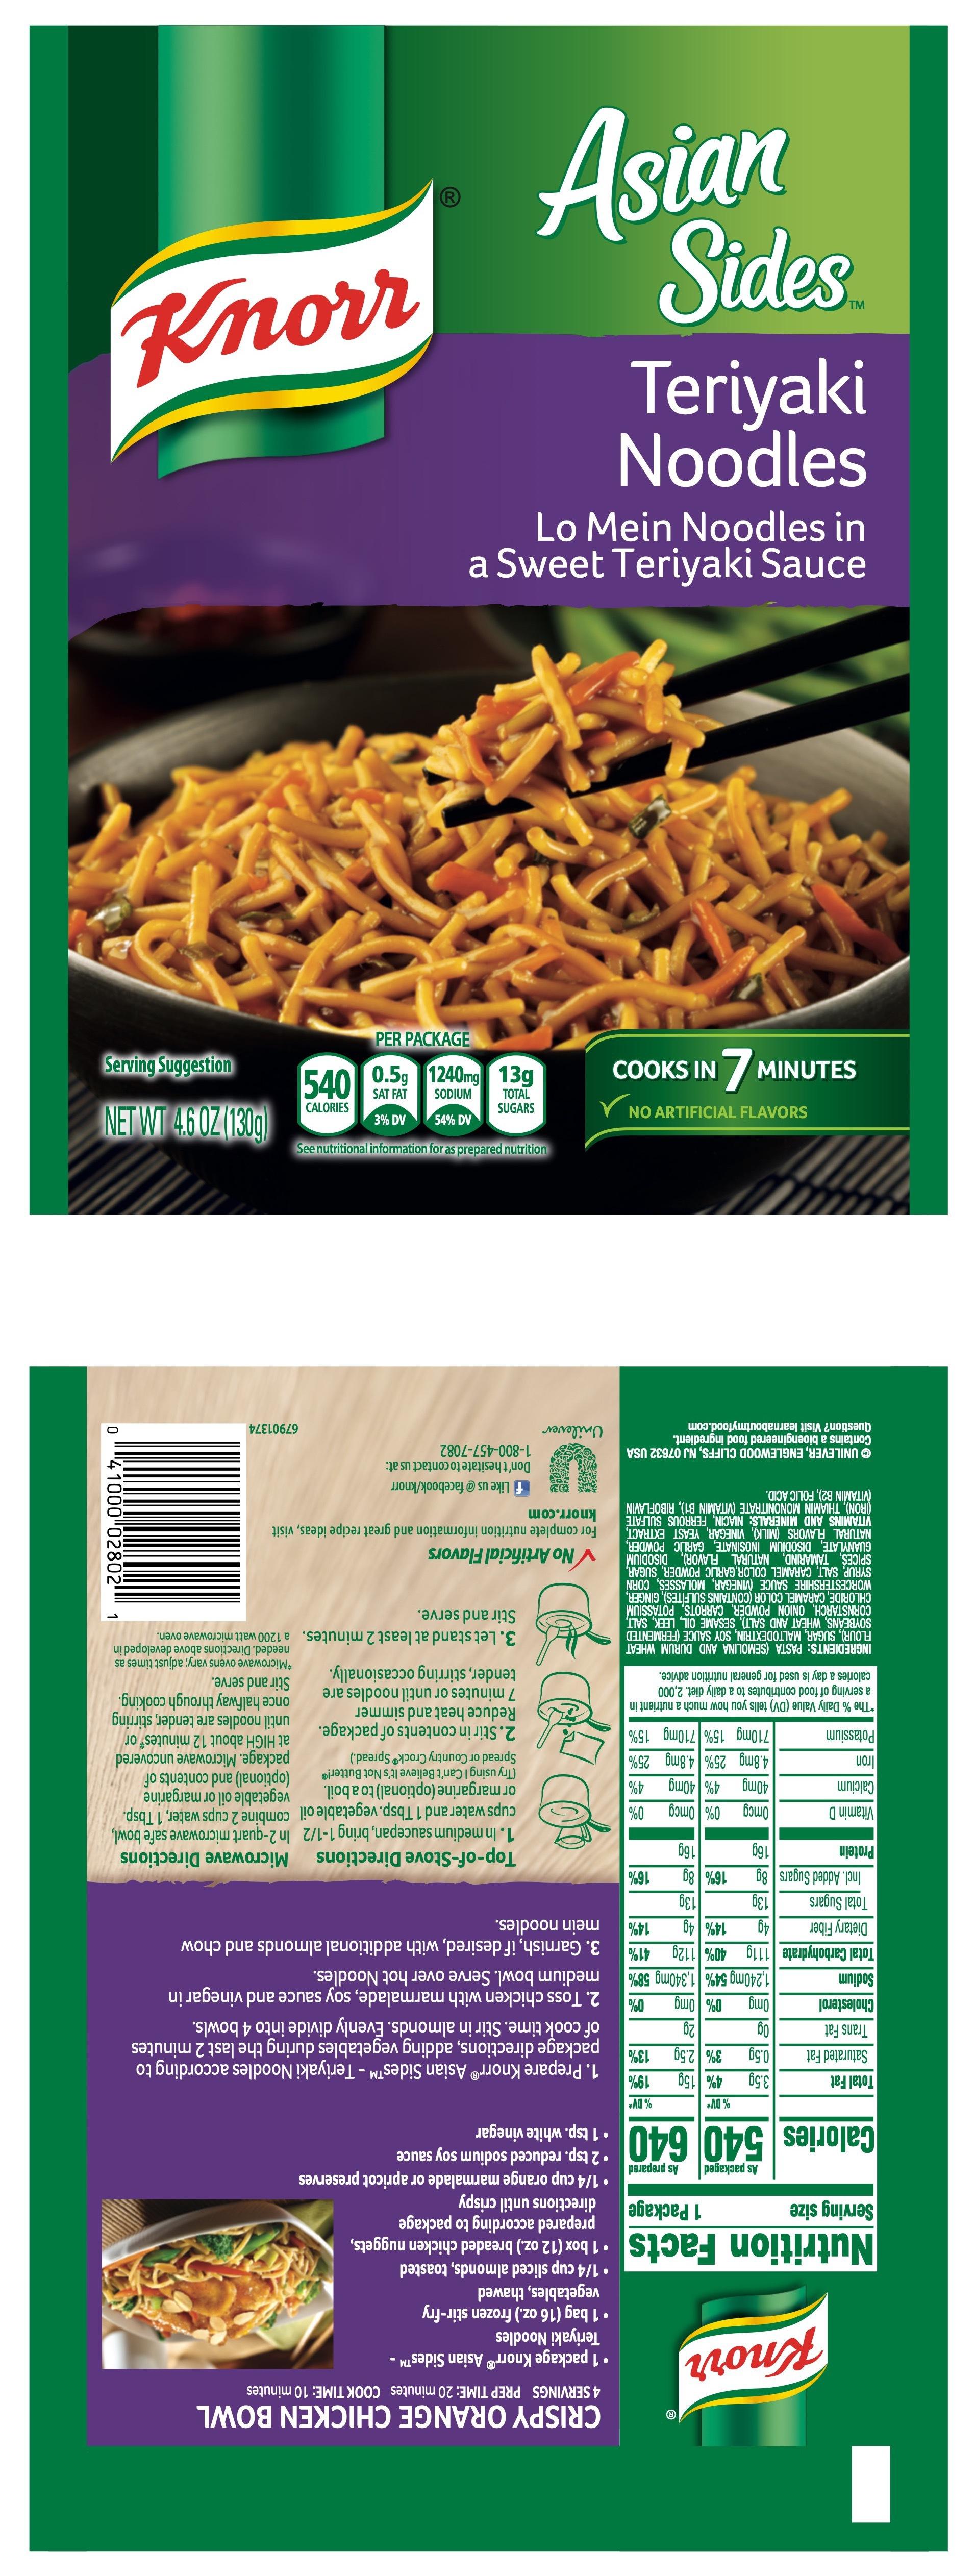 Smartlabel Teriyaki Lo Mein Noodles In A Sweet Teriyaki Sauce 041000028021